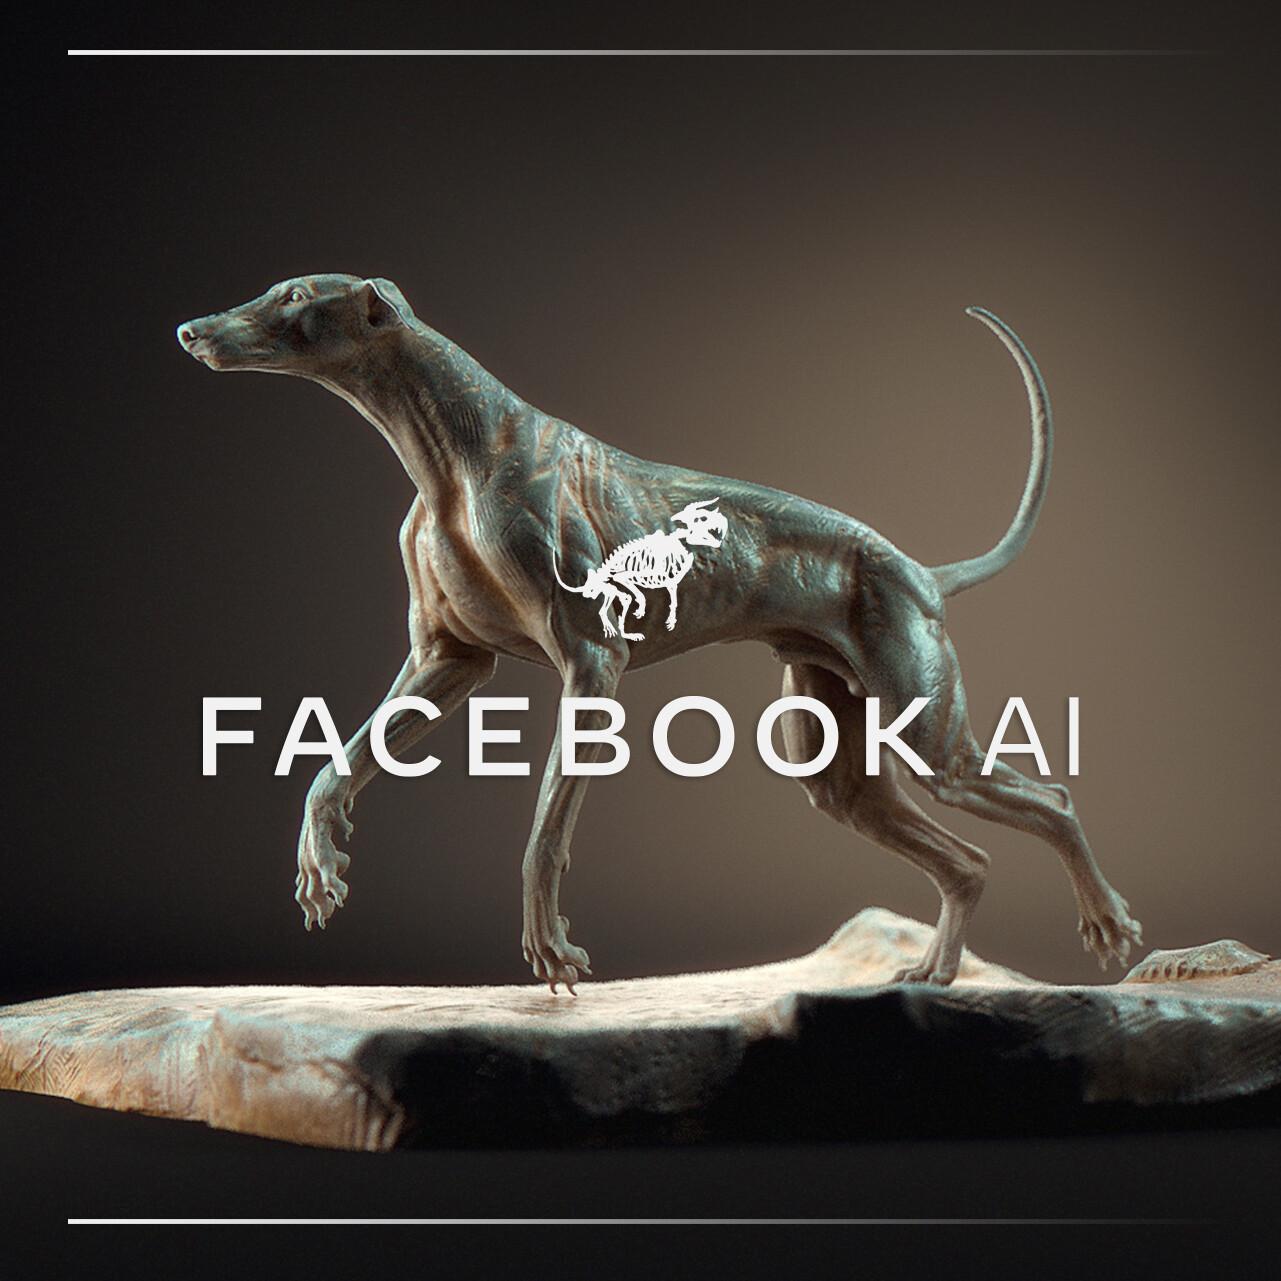 FAIR's (Facebook AI) project team members: Natalia Neverova (Lead, Research Scientist) Andrea Vevaldi (Research Scientist) Patrick Labatut (Software Engineering Manager) Ignacio Rocco (Postdoctoral Researcher)